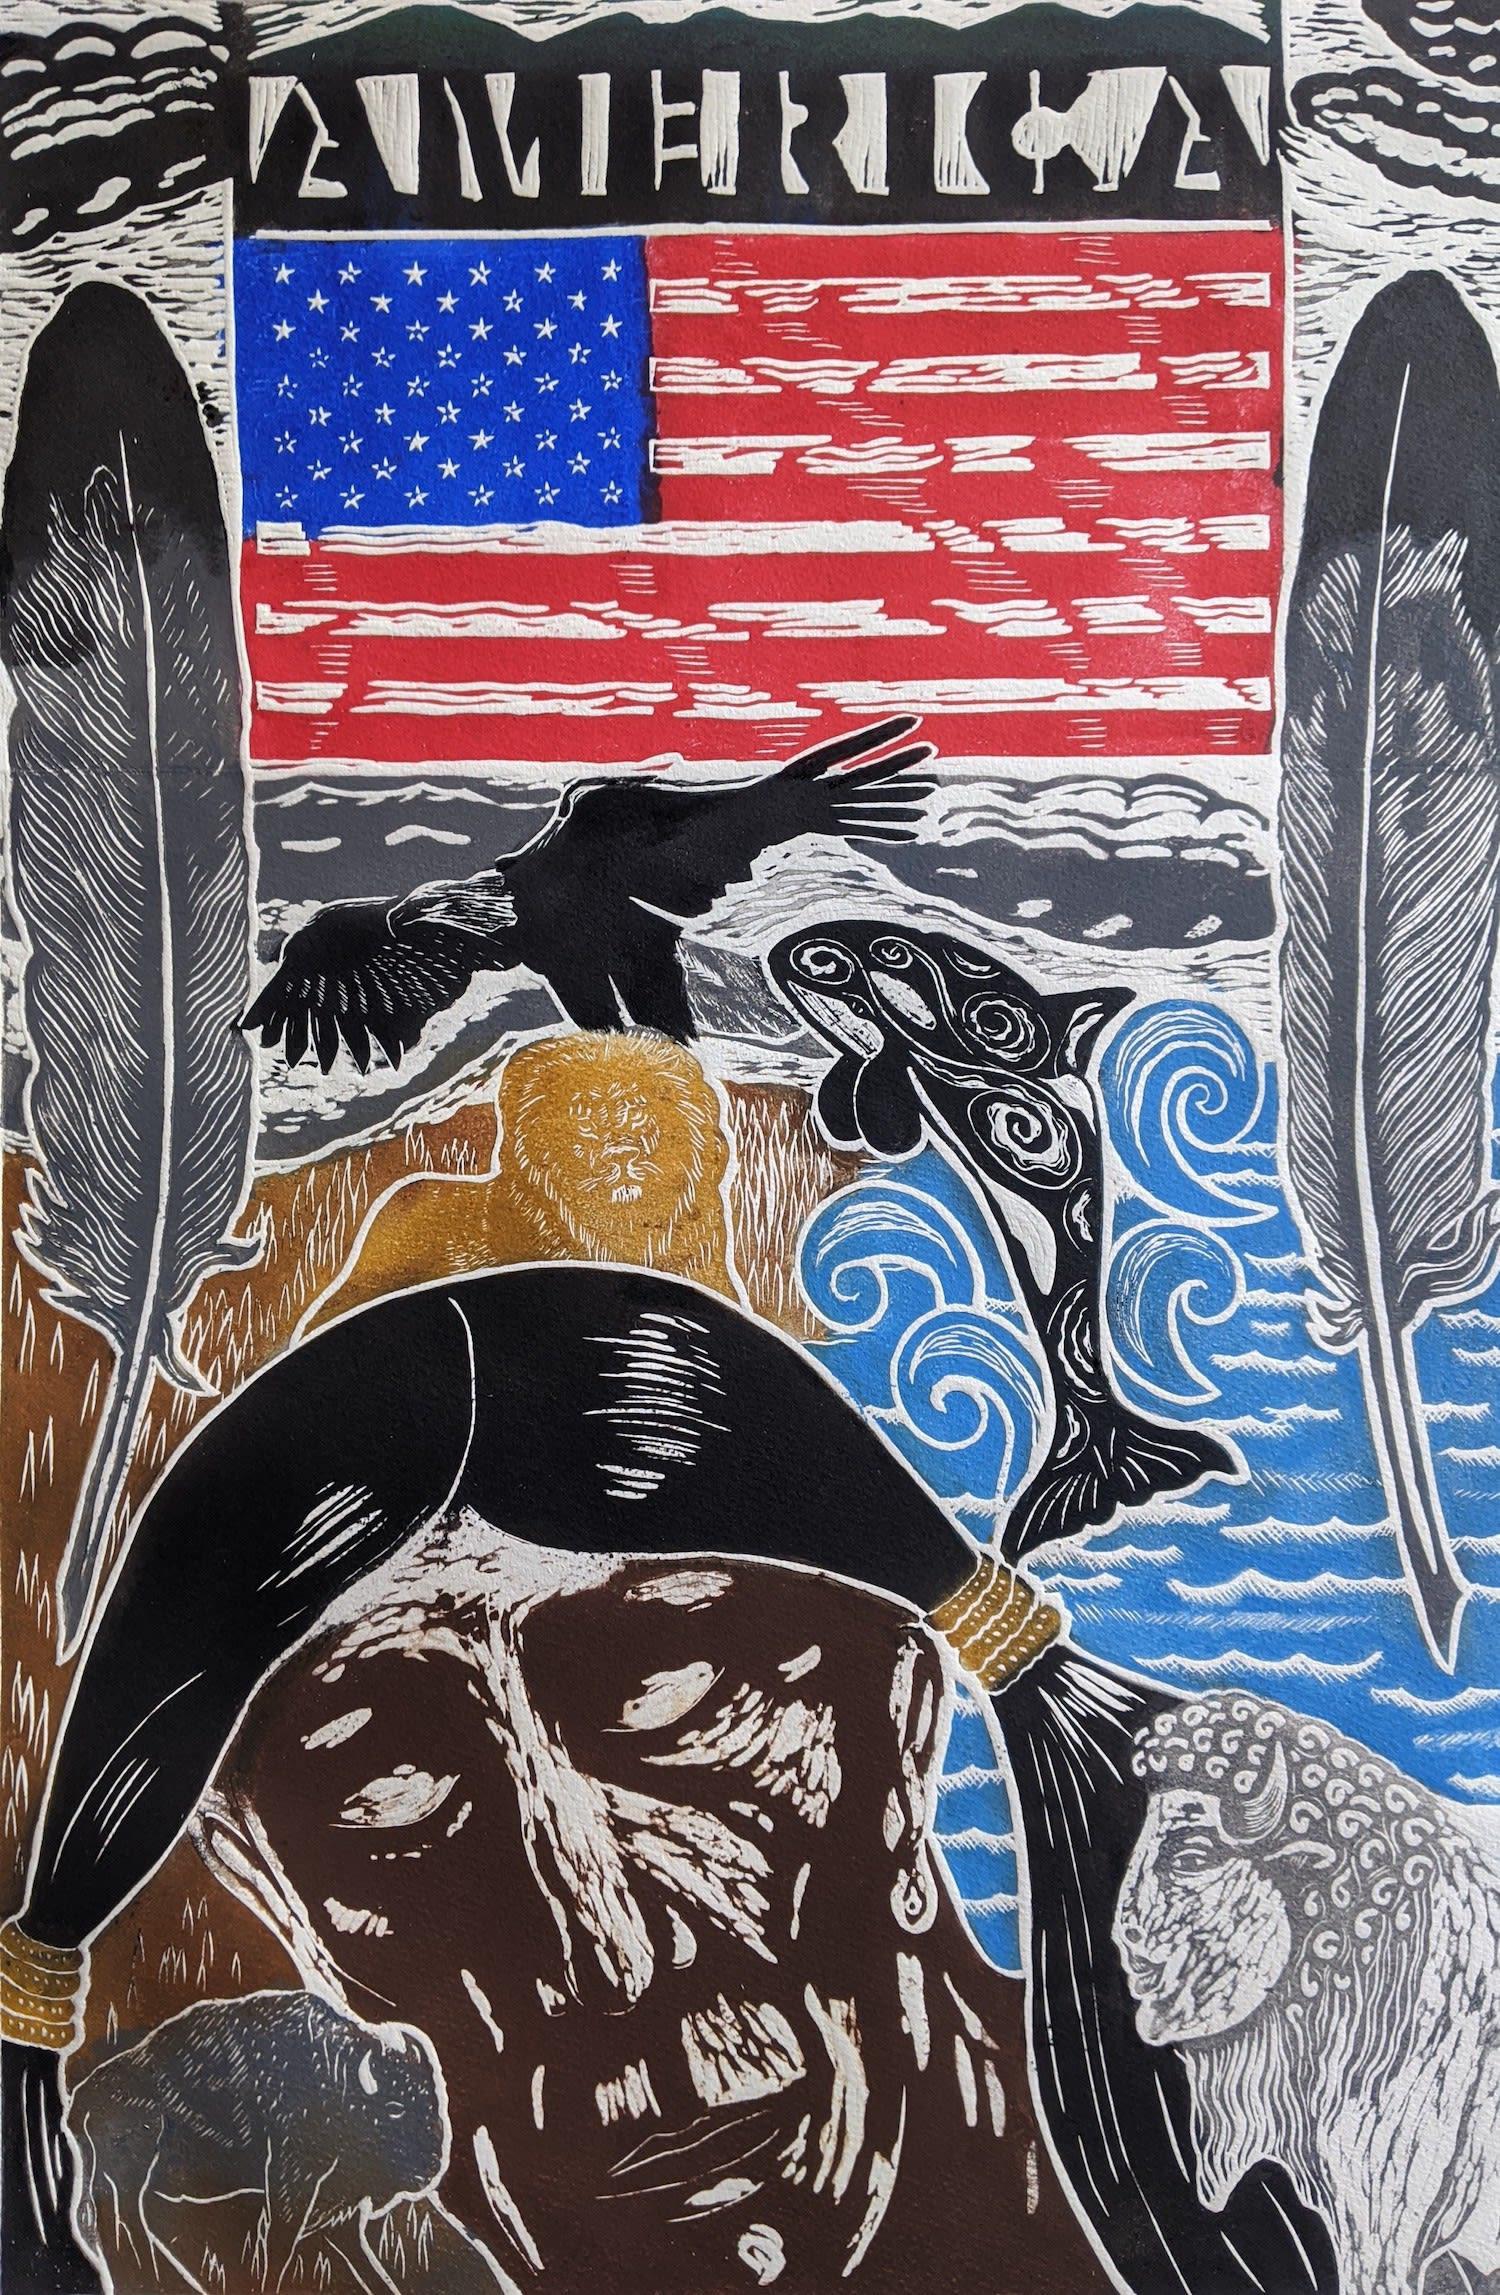 "<span class=""link fancybox-details-link""><a href=""/exhibitions/21/works/artworks_standalone10927/"">View Detail Page</a></span><div class=""artist""><span class=""artist""><strong>Linda Landers RE</strong></span></div><div class=""title""><em>America - A Prophecy</em></div><div class=""medium"">relief print</div><div class=""dimensions"">84 x 63cm framed<br>67 x 45cm image</div><div class=""edition_details"">edition of 50</div>"